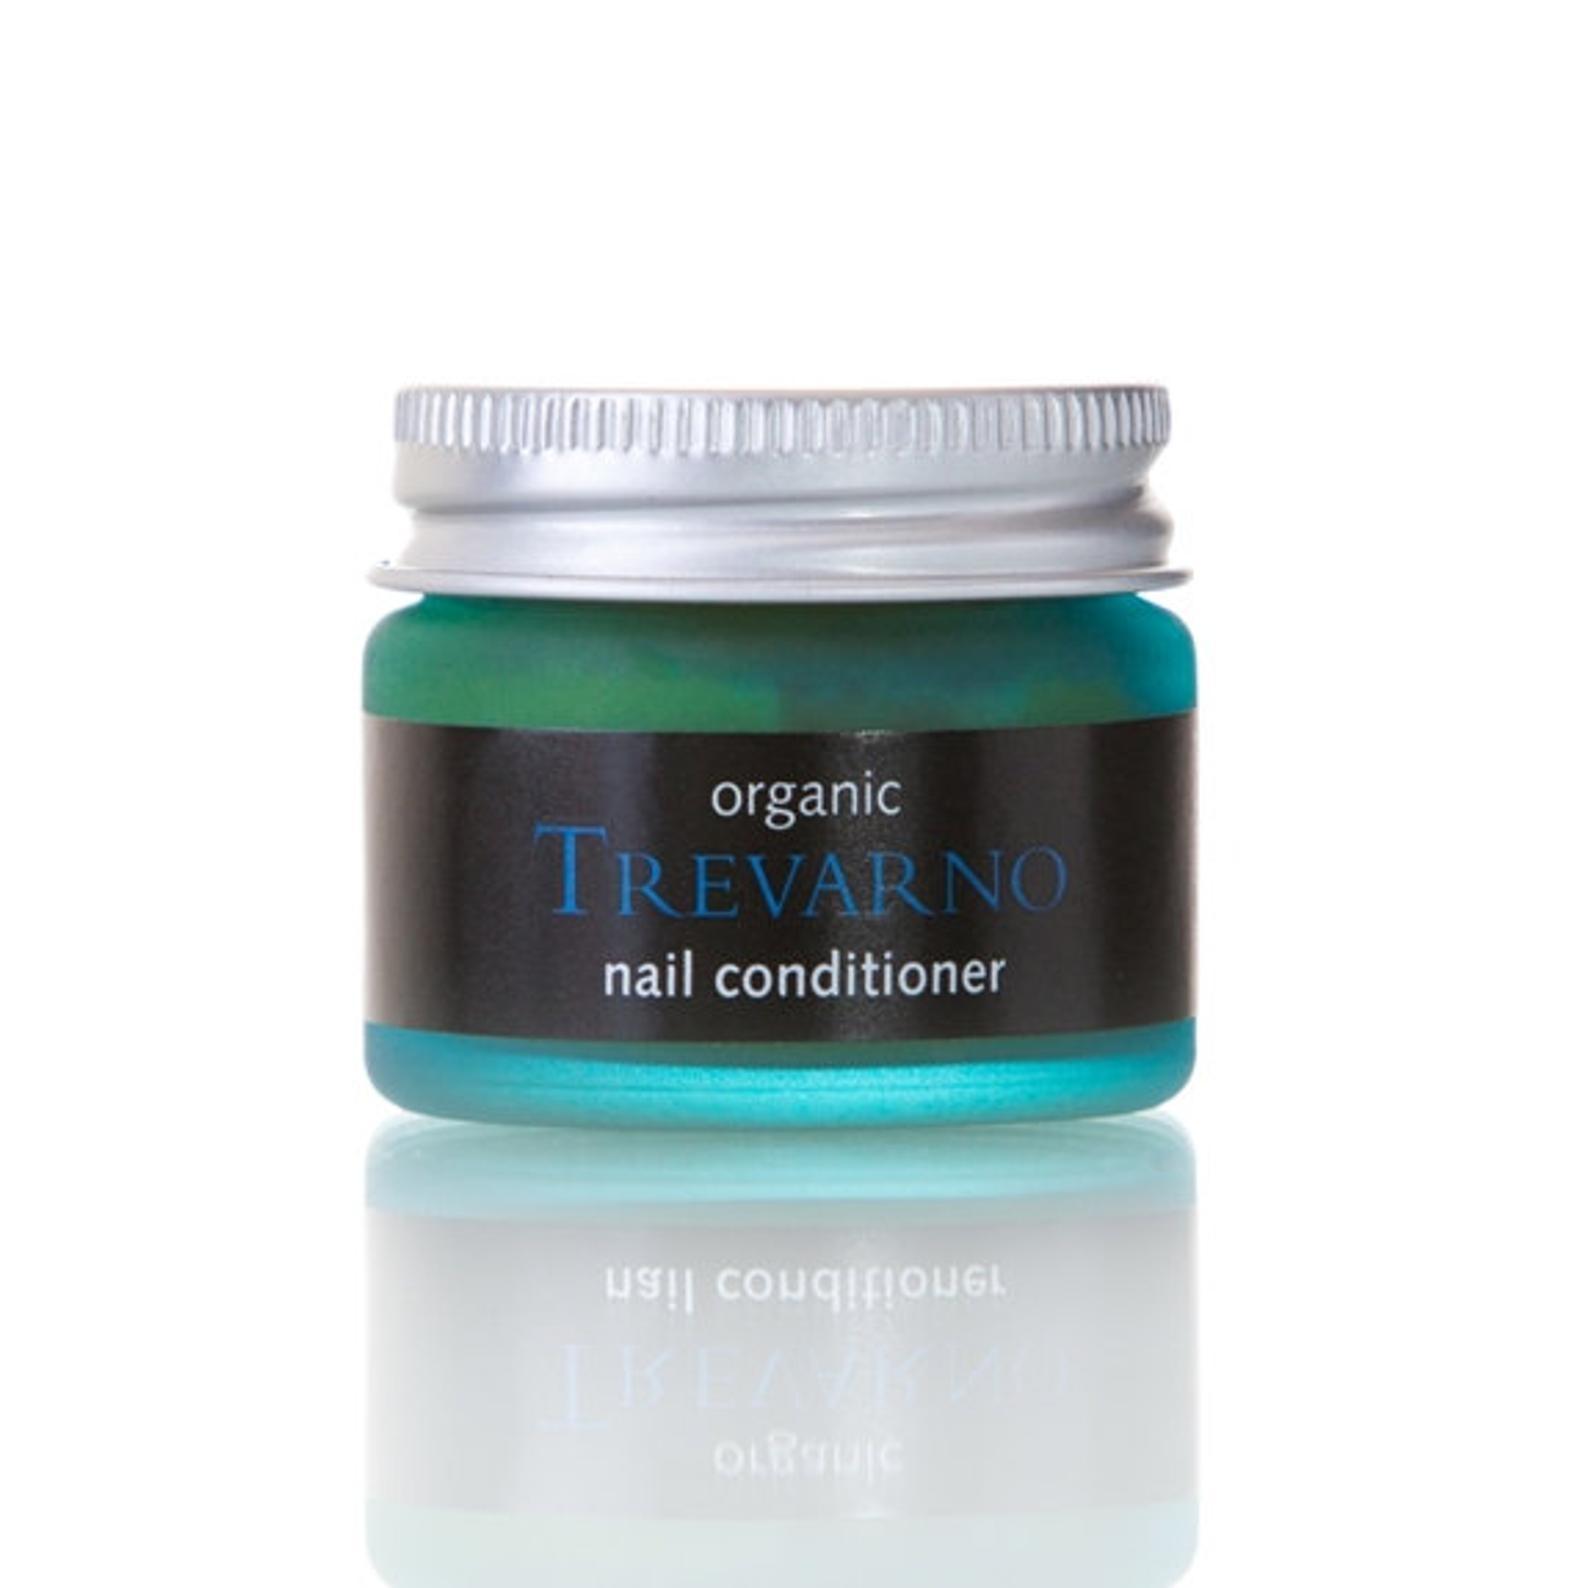 Organic Trevarno Nail Conditioner-15ml